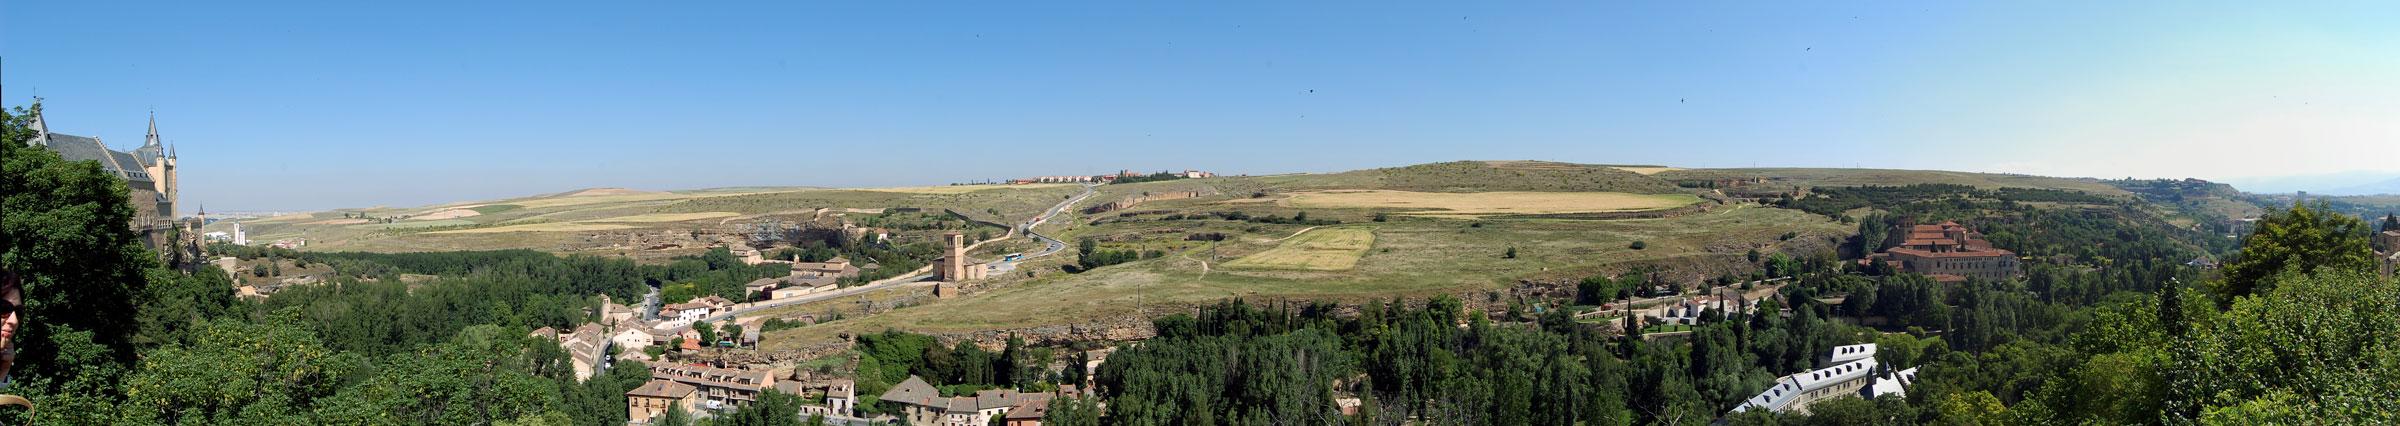 180-degree view from Segovia Alcazar